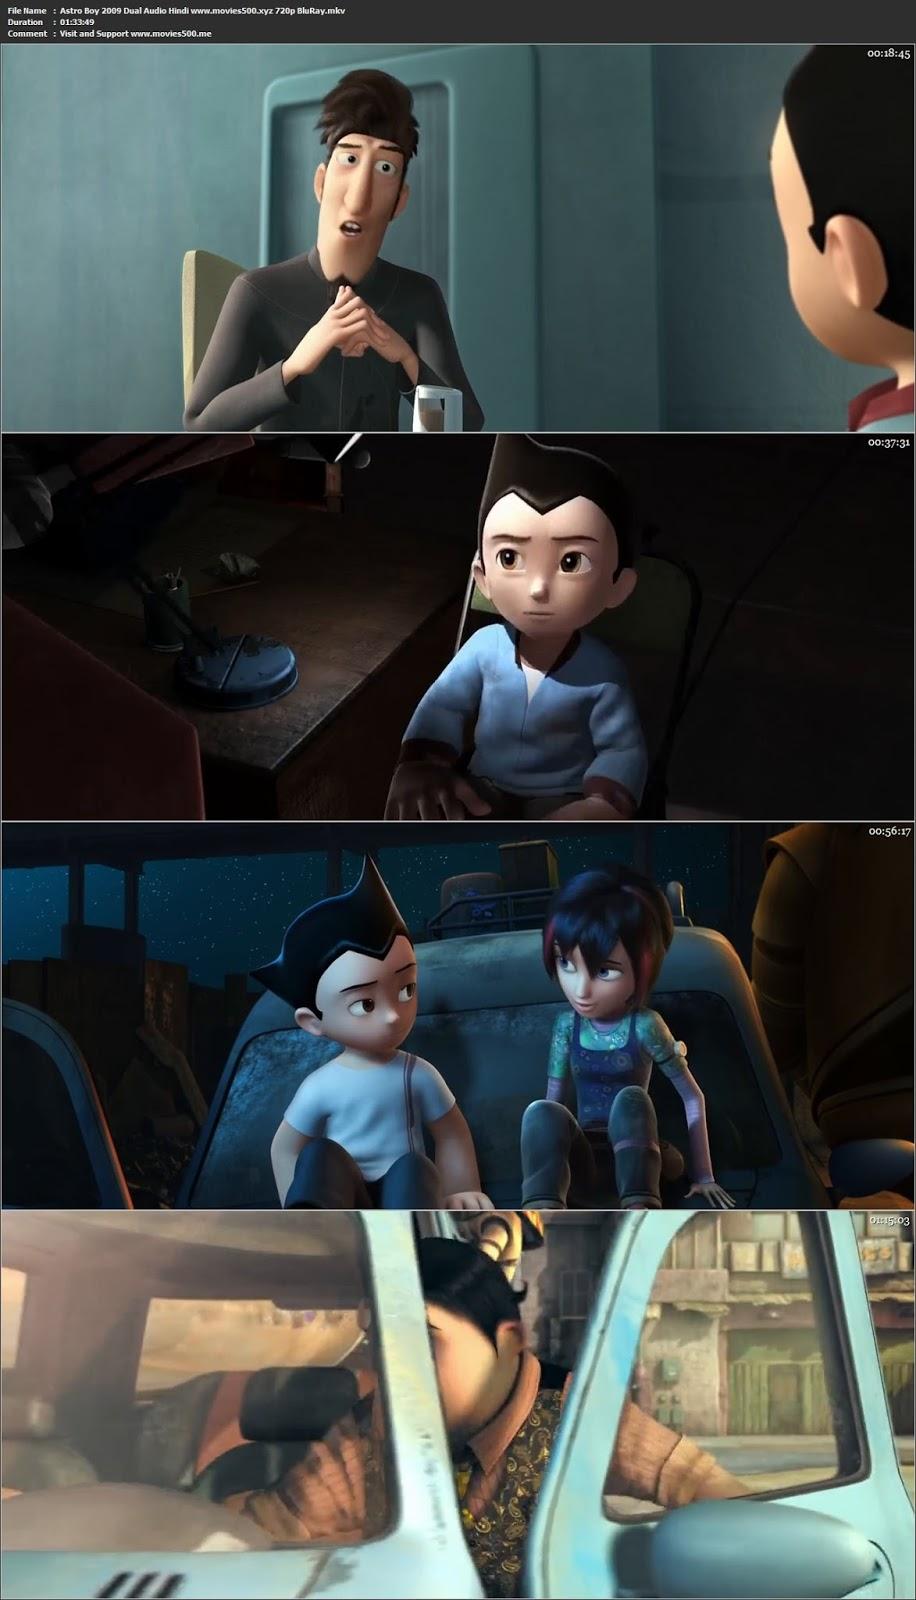 Astro Boy 2009 Dual Audio Hindi Full Movie BluRay 720p at movies500.site